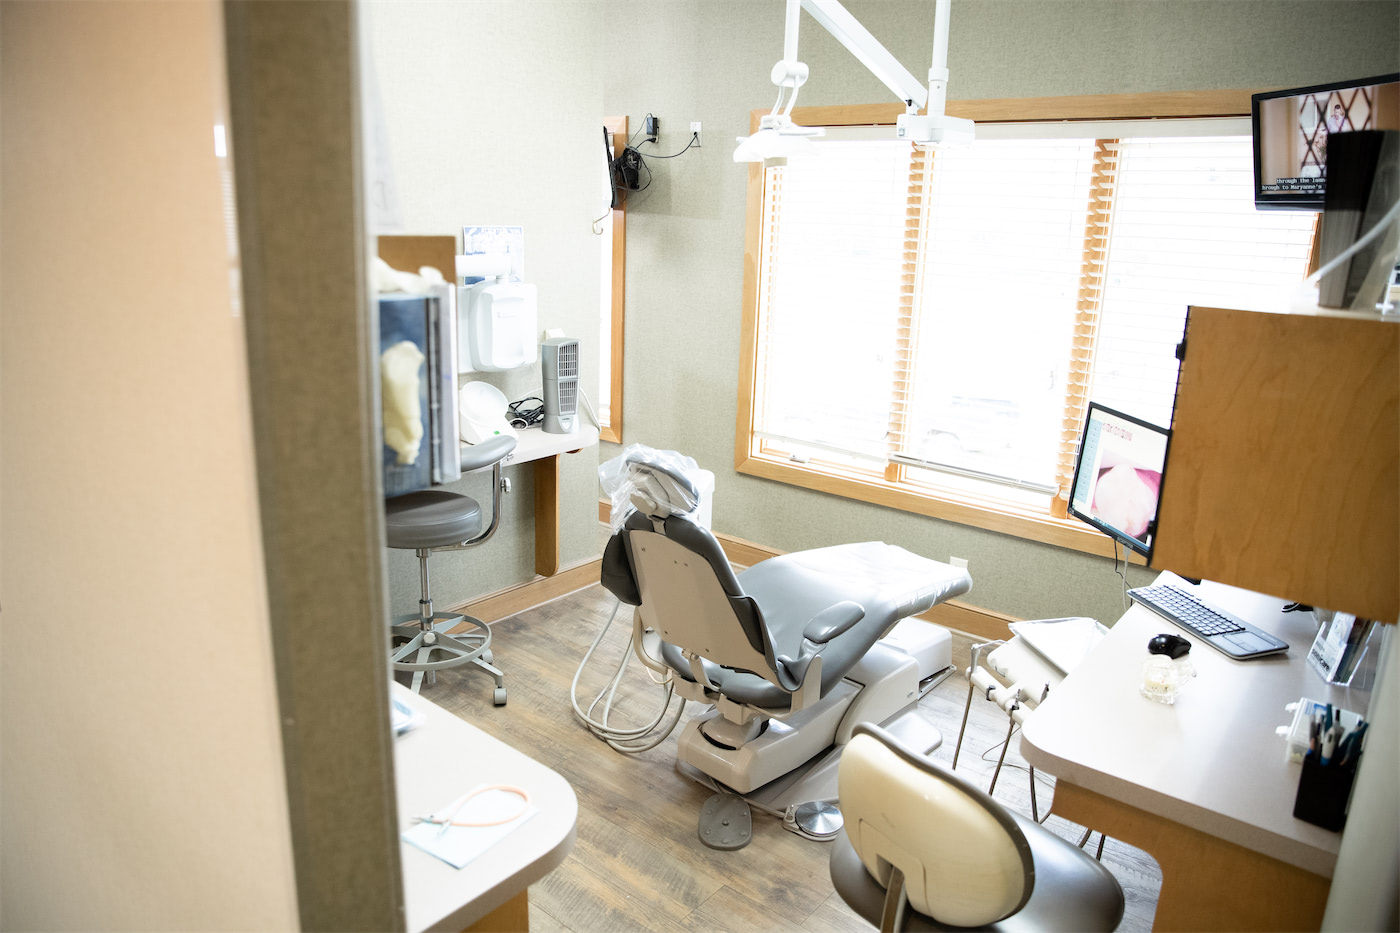 Exam/Operatory Room